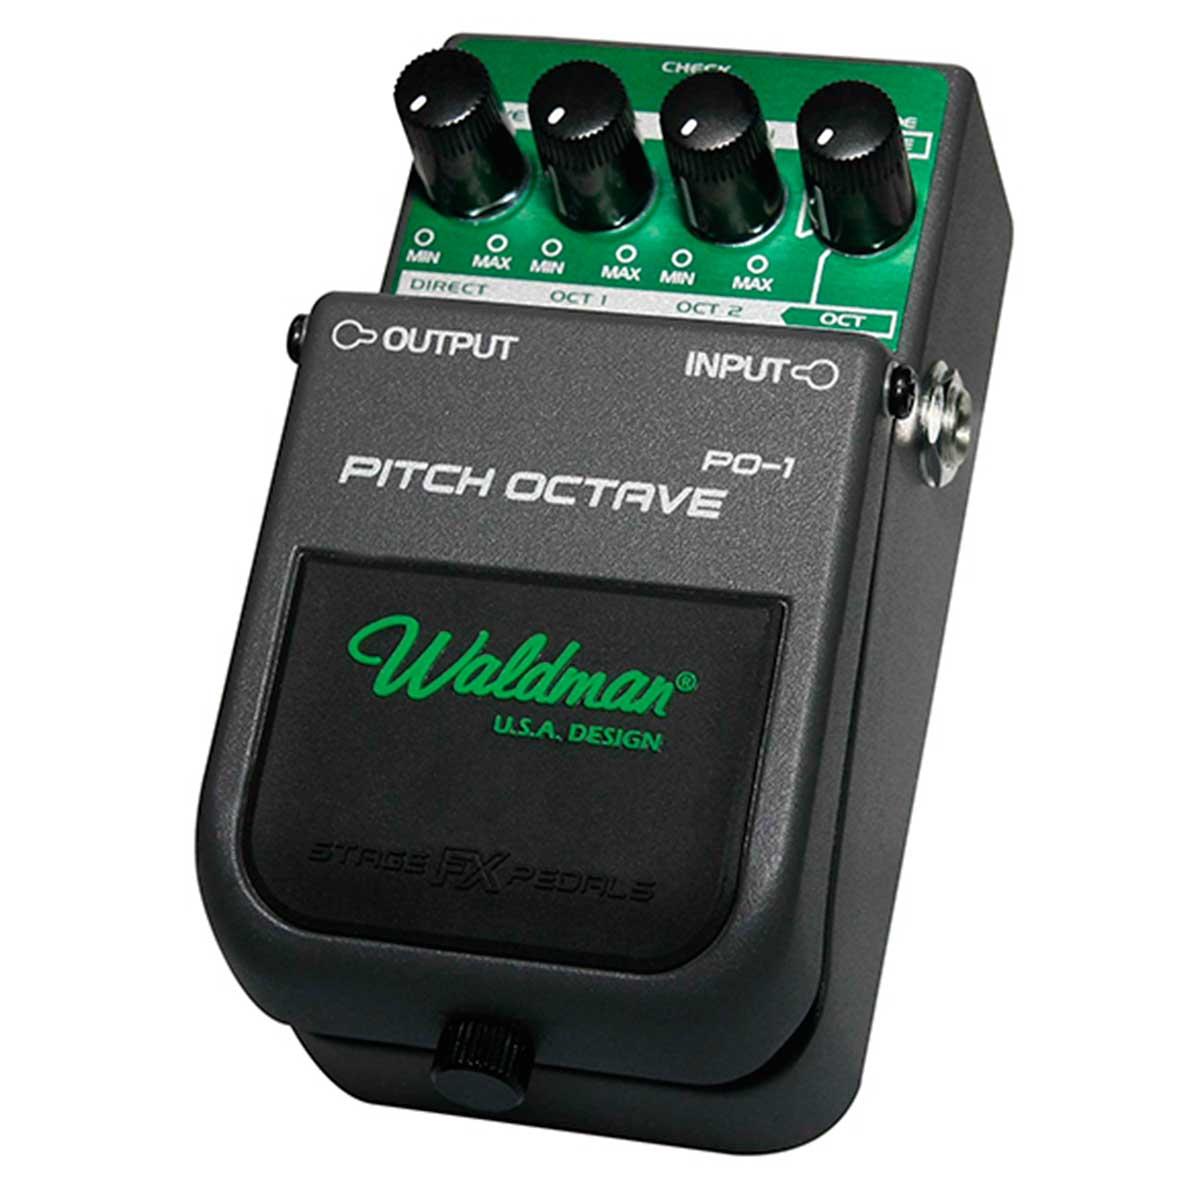 Pedal Guitarra PO1 Pitch Octave PO 1 - Waldman